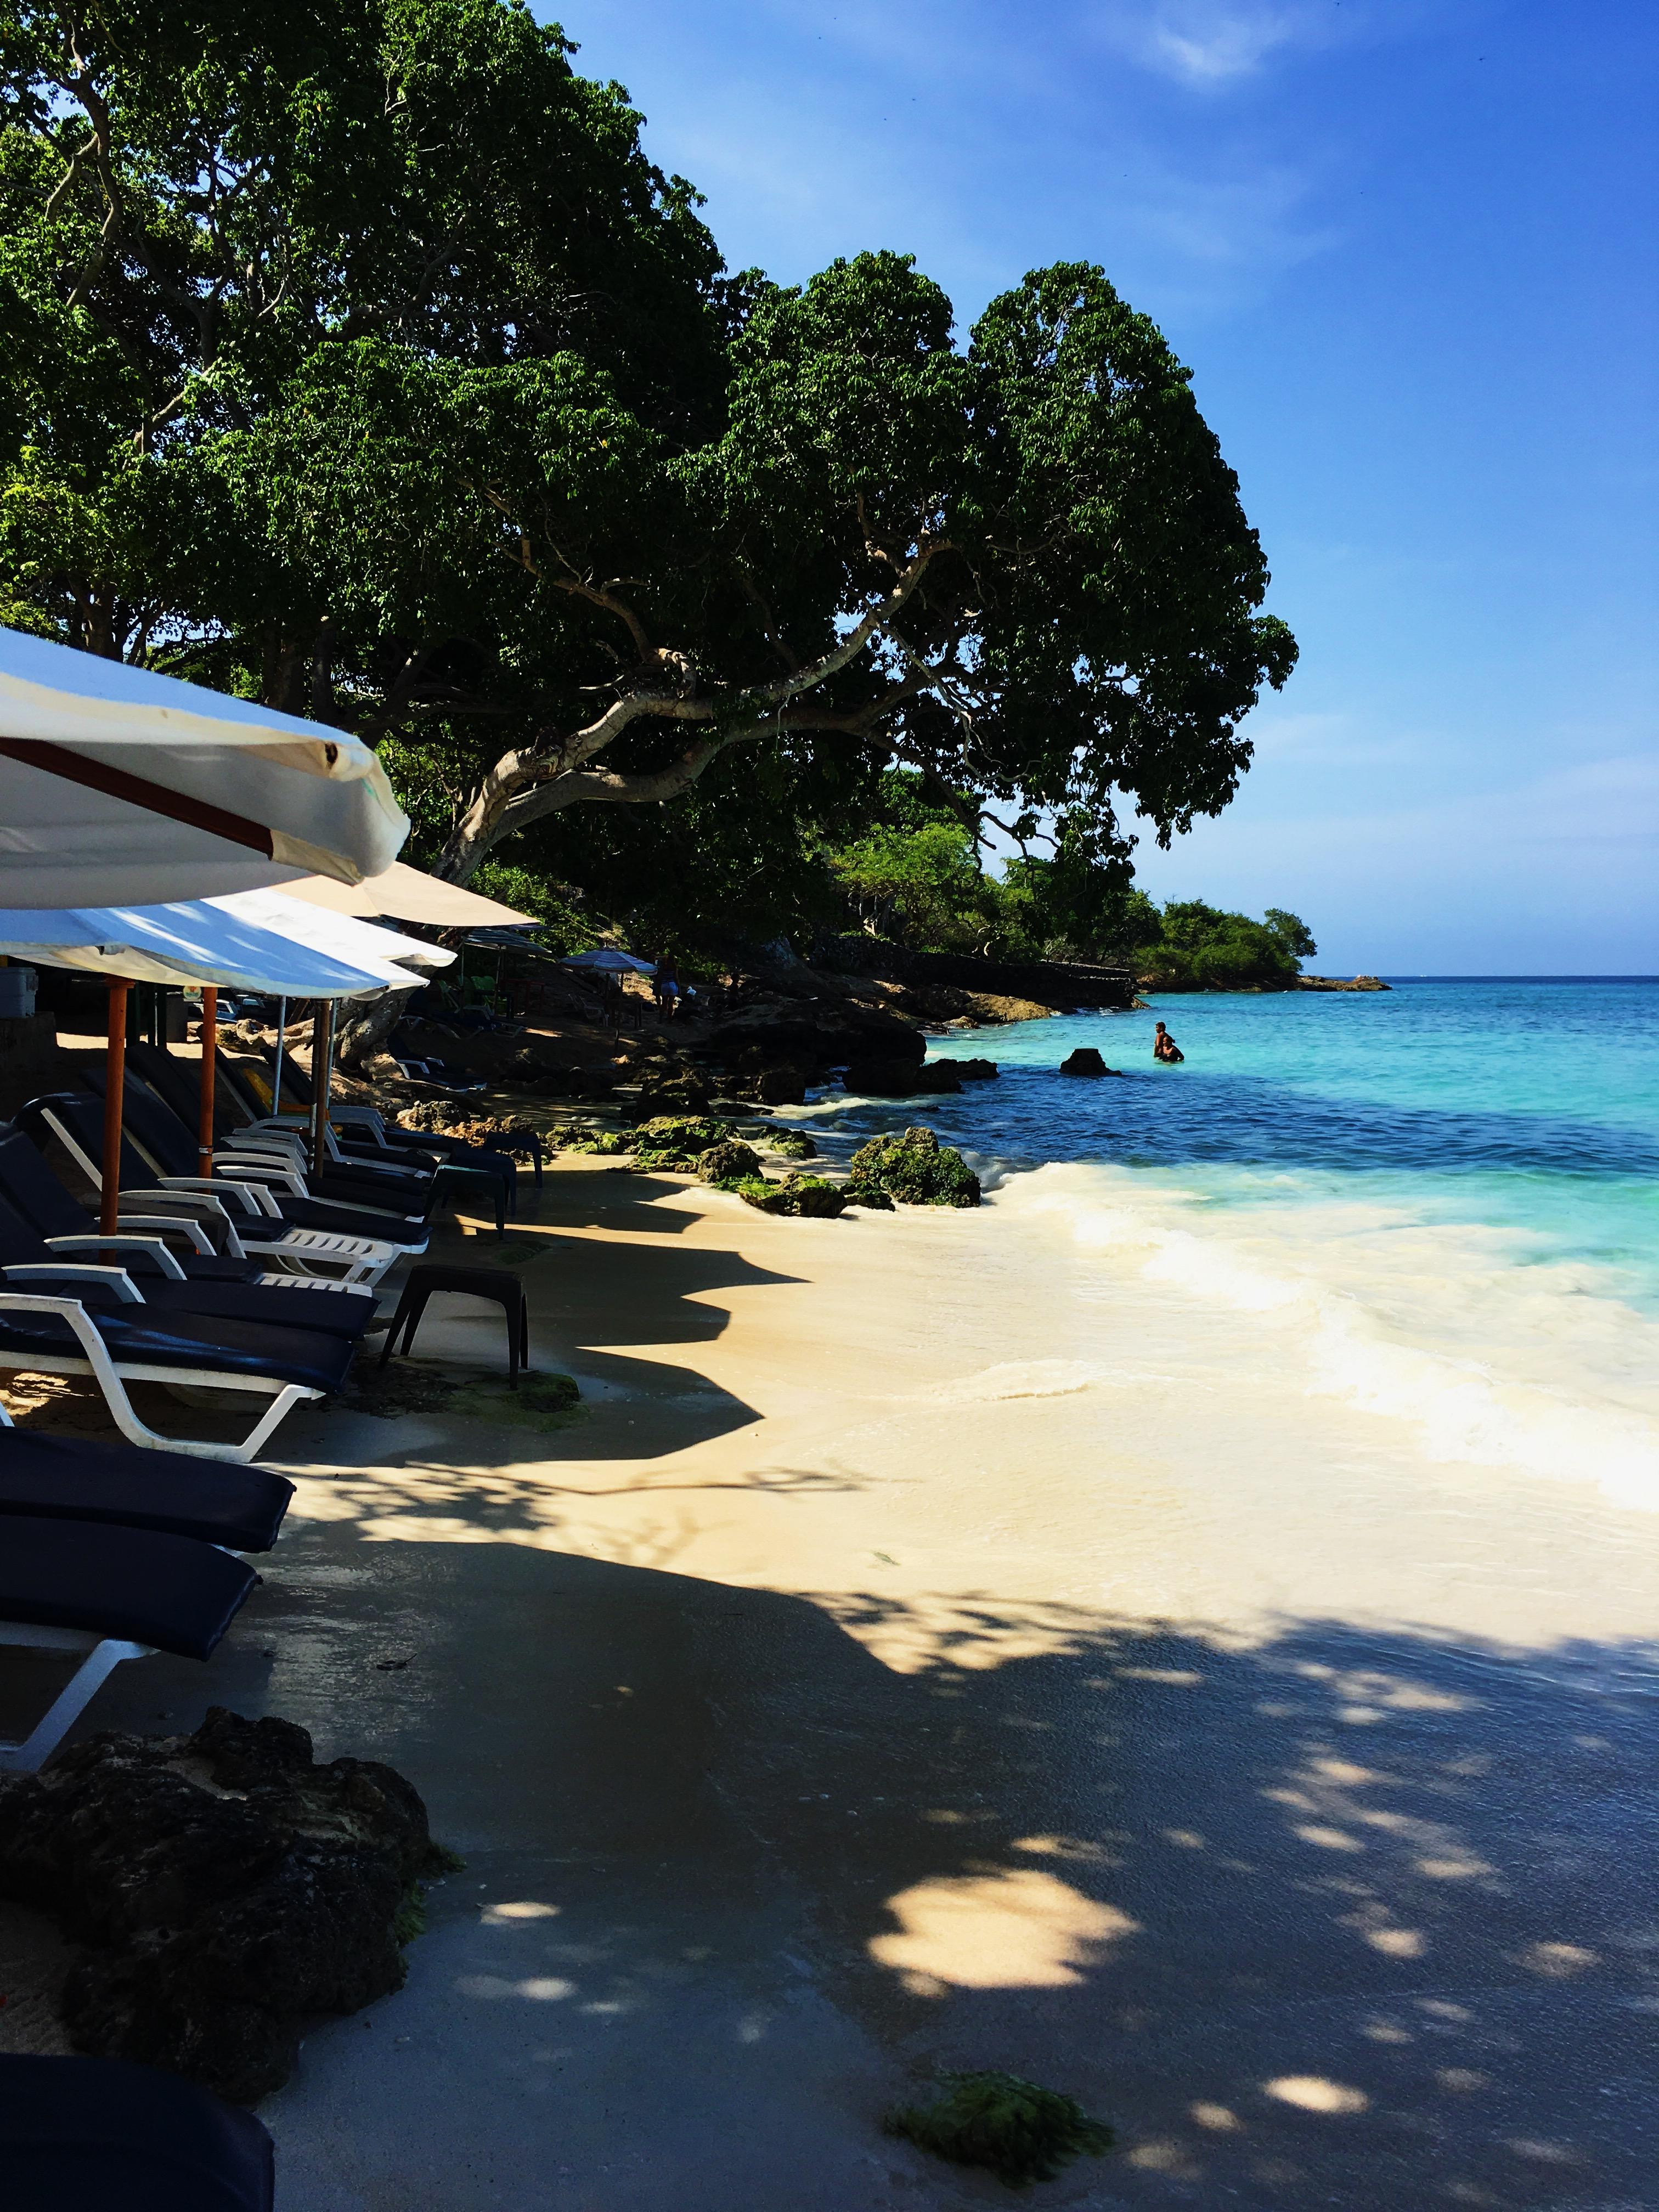 lcm-liveclothesminded-colombia-cartagena-playa blanca-beach-vacation